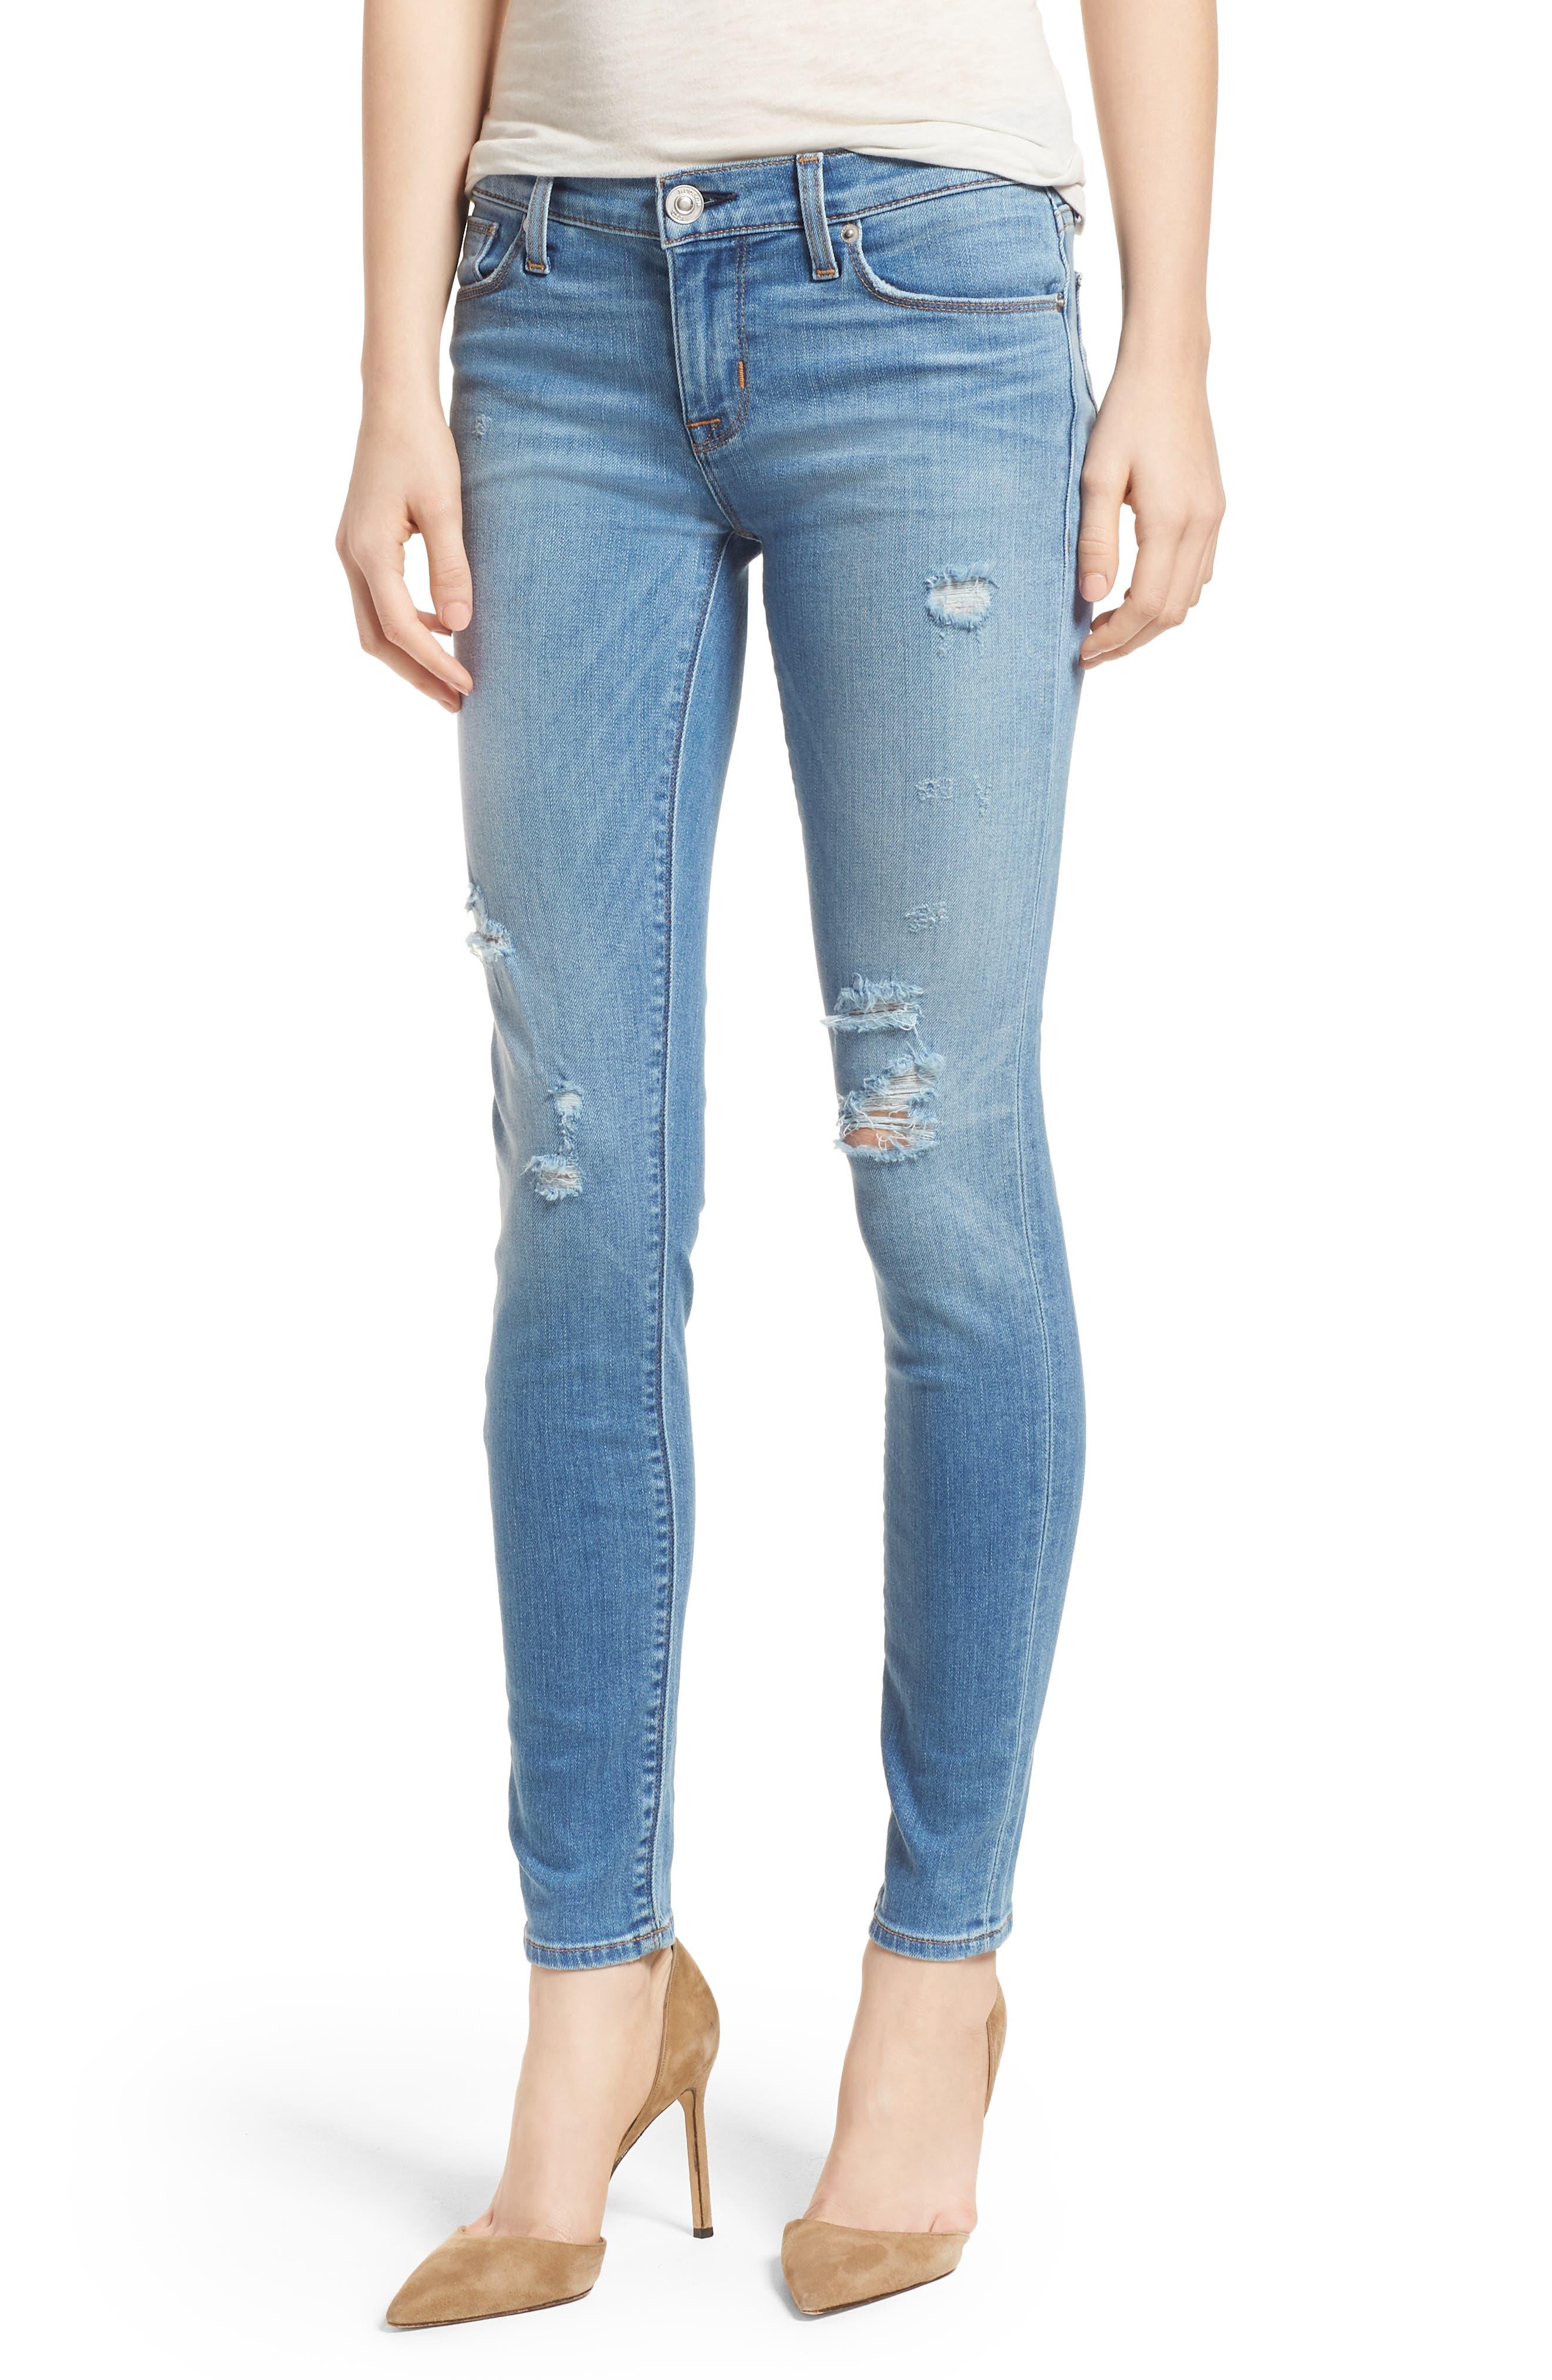 Main Image - Hudson Jeans Krista Ankle Super Skinny Jeans (No Tears)